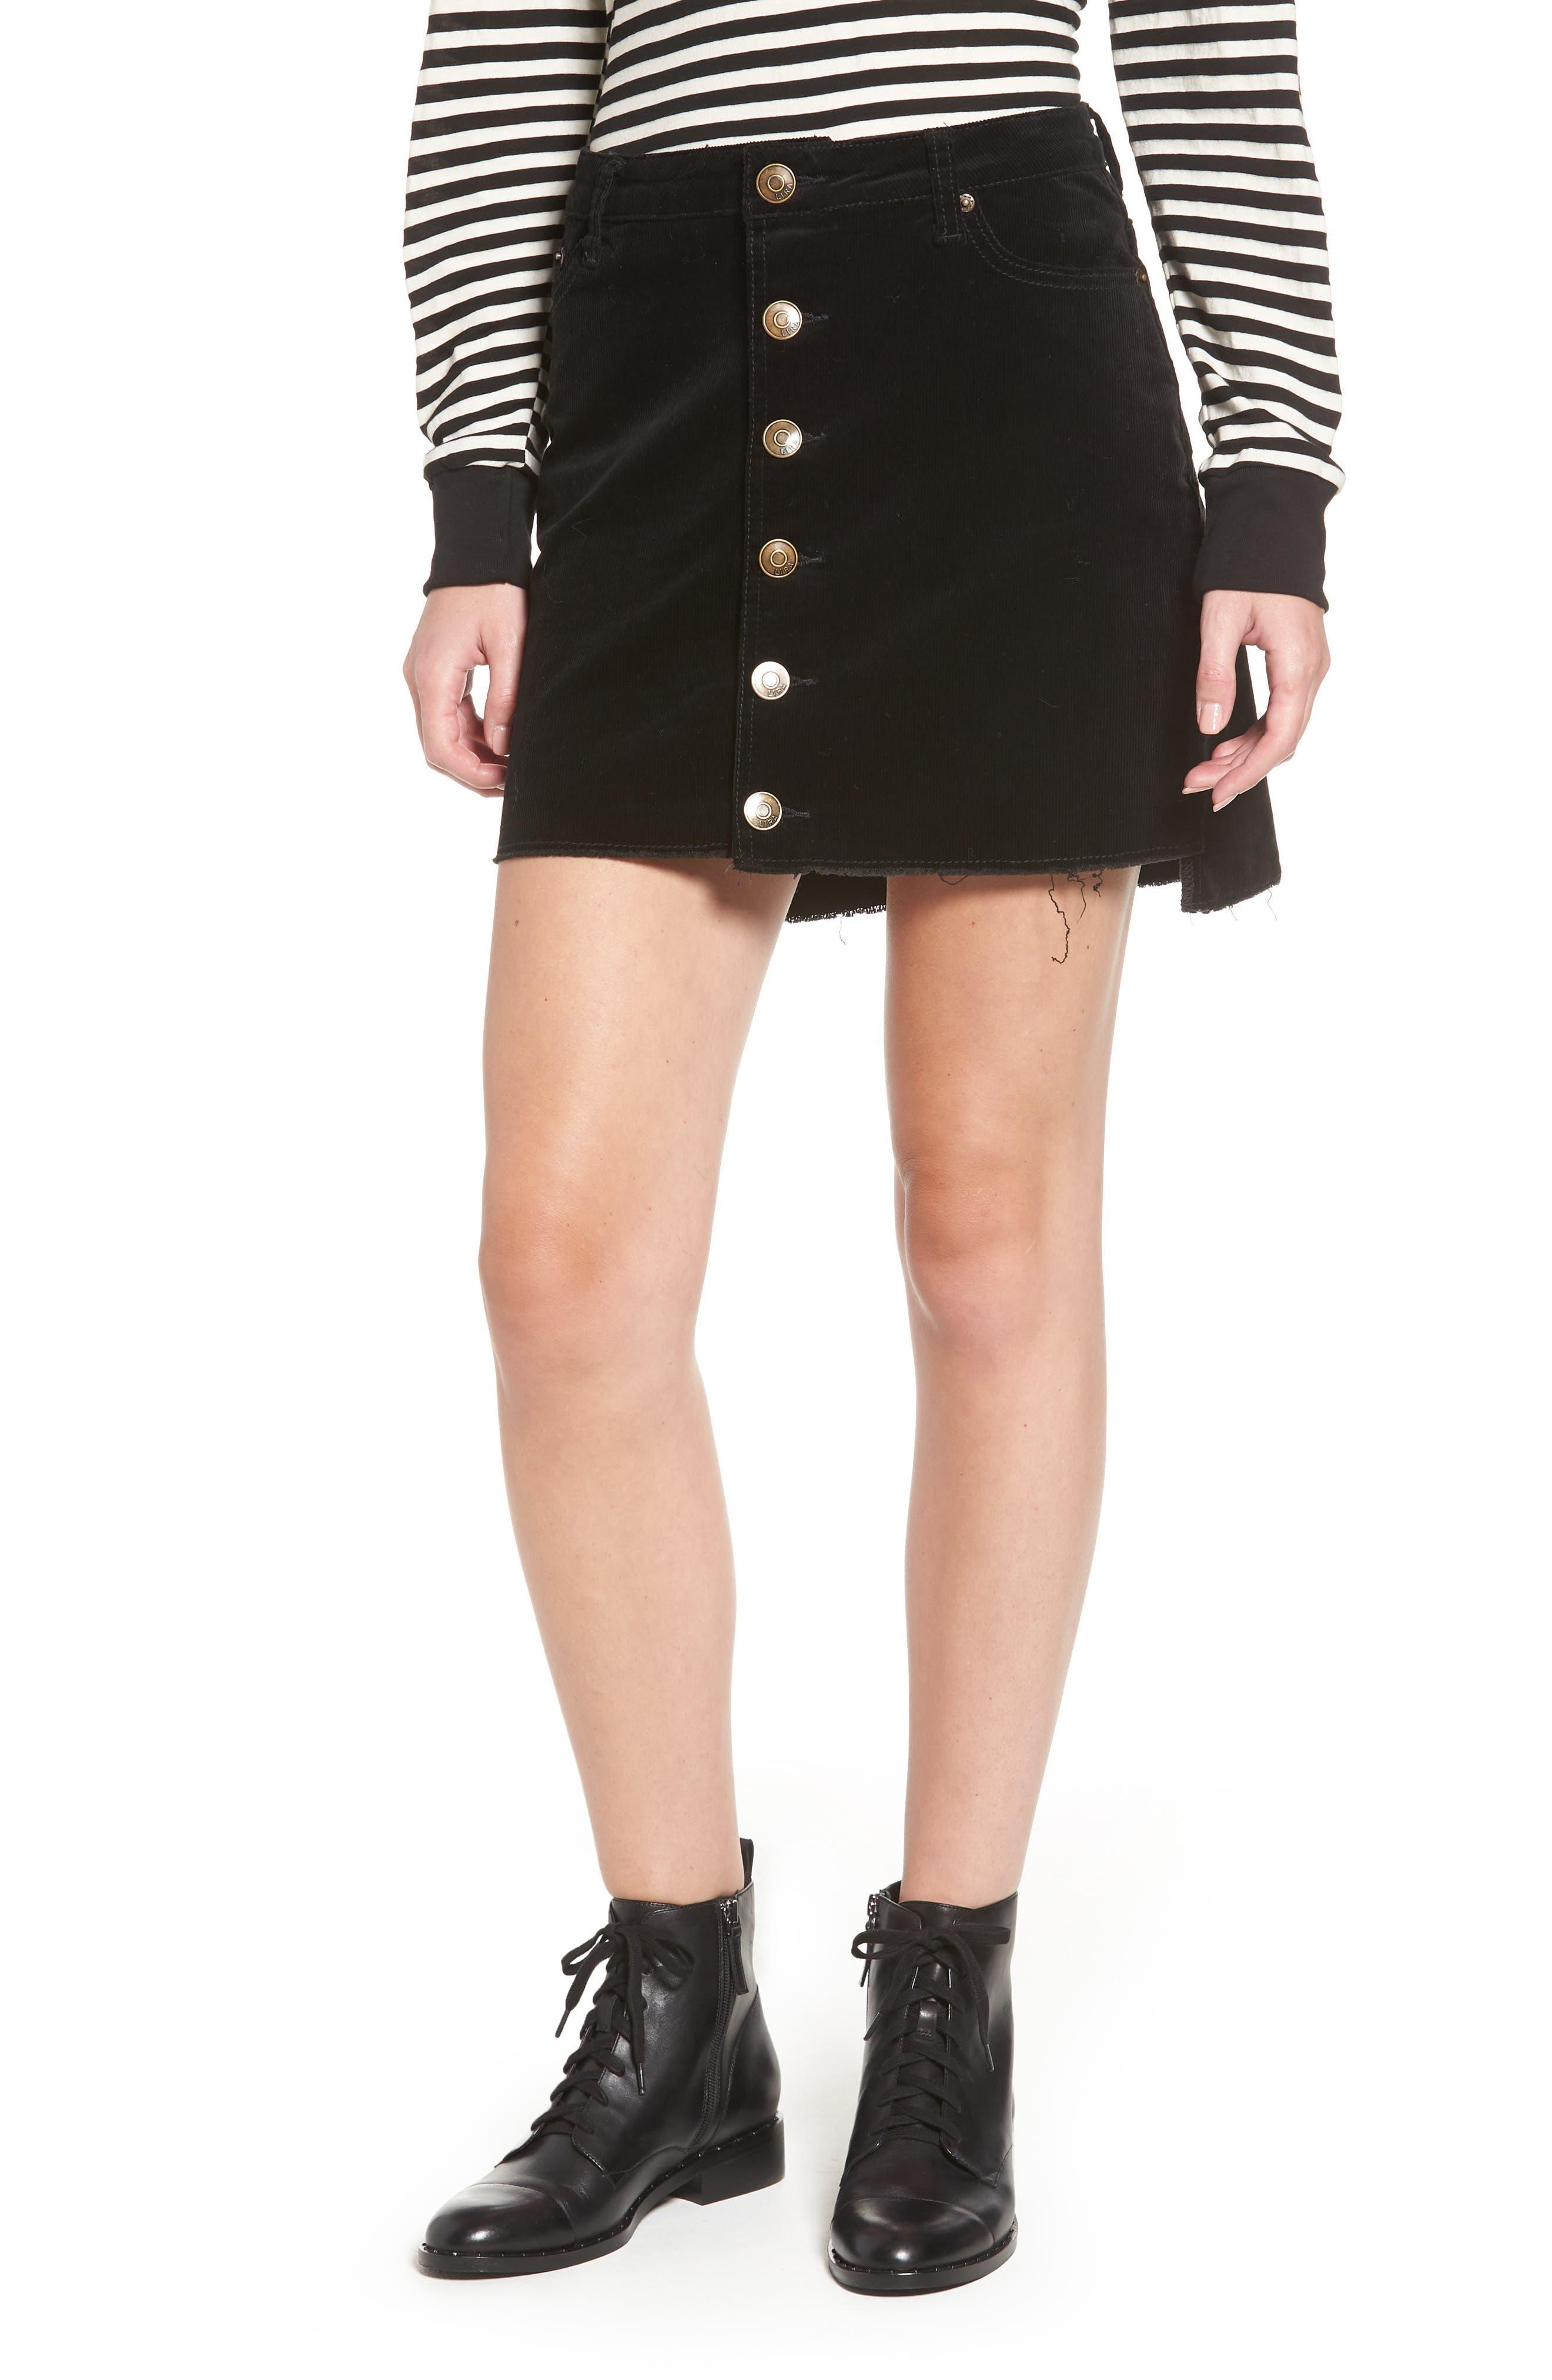 Lira Clothing Mia Cutoff Corduroy Skirt, Black